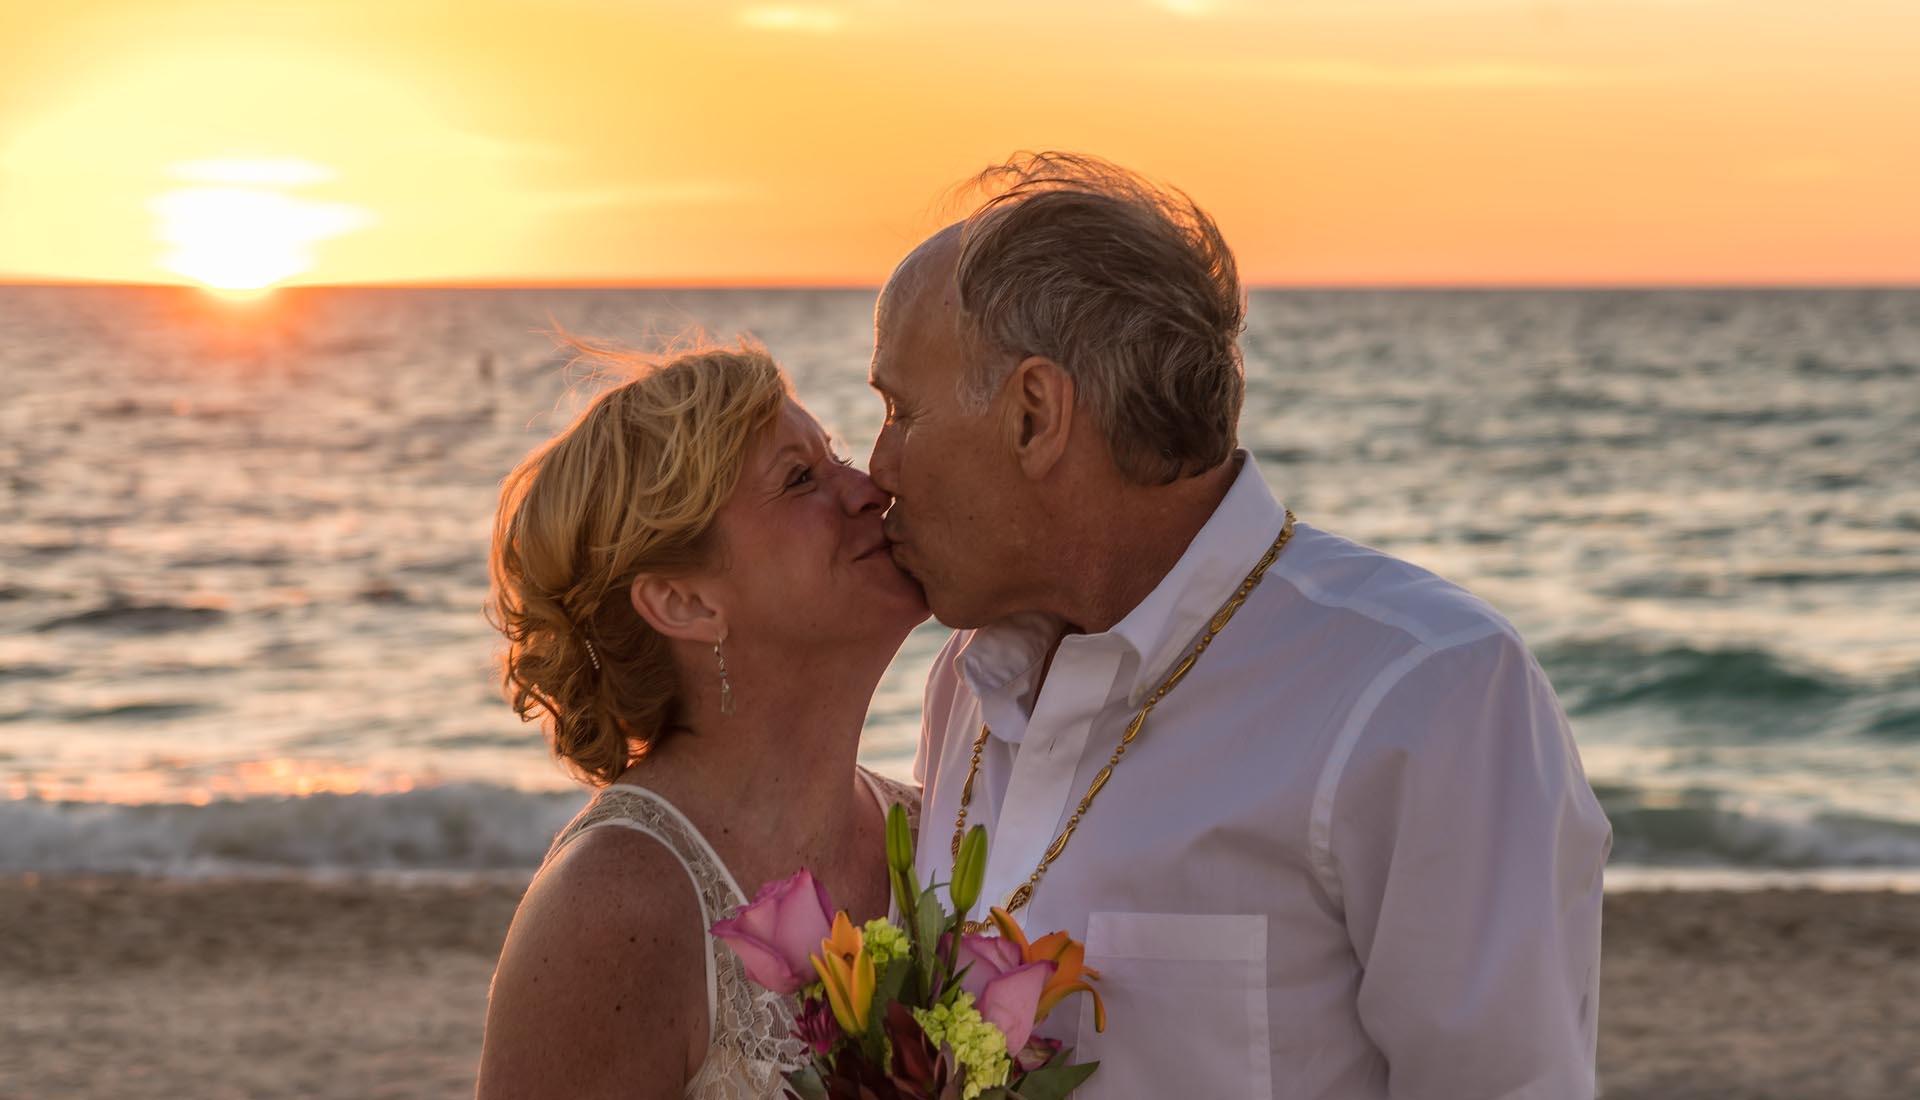 Obnova svatebního slibu